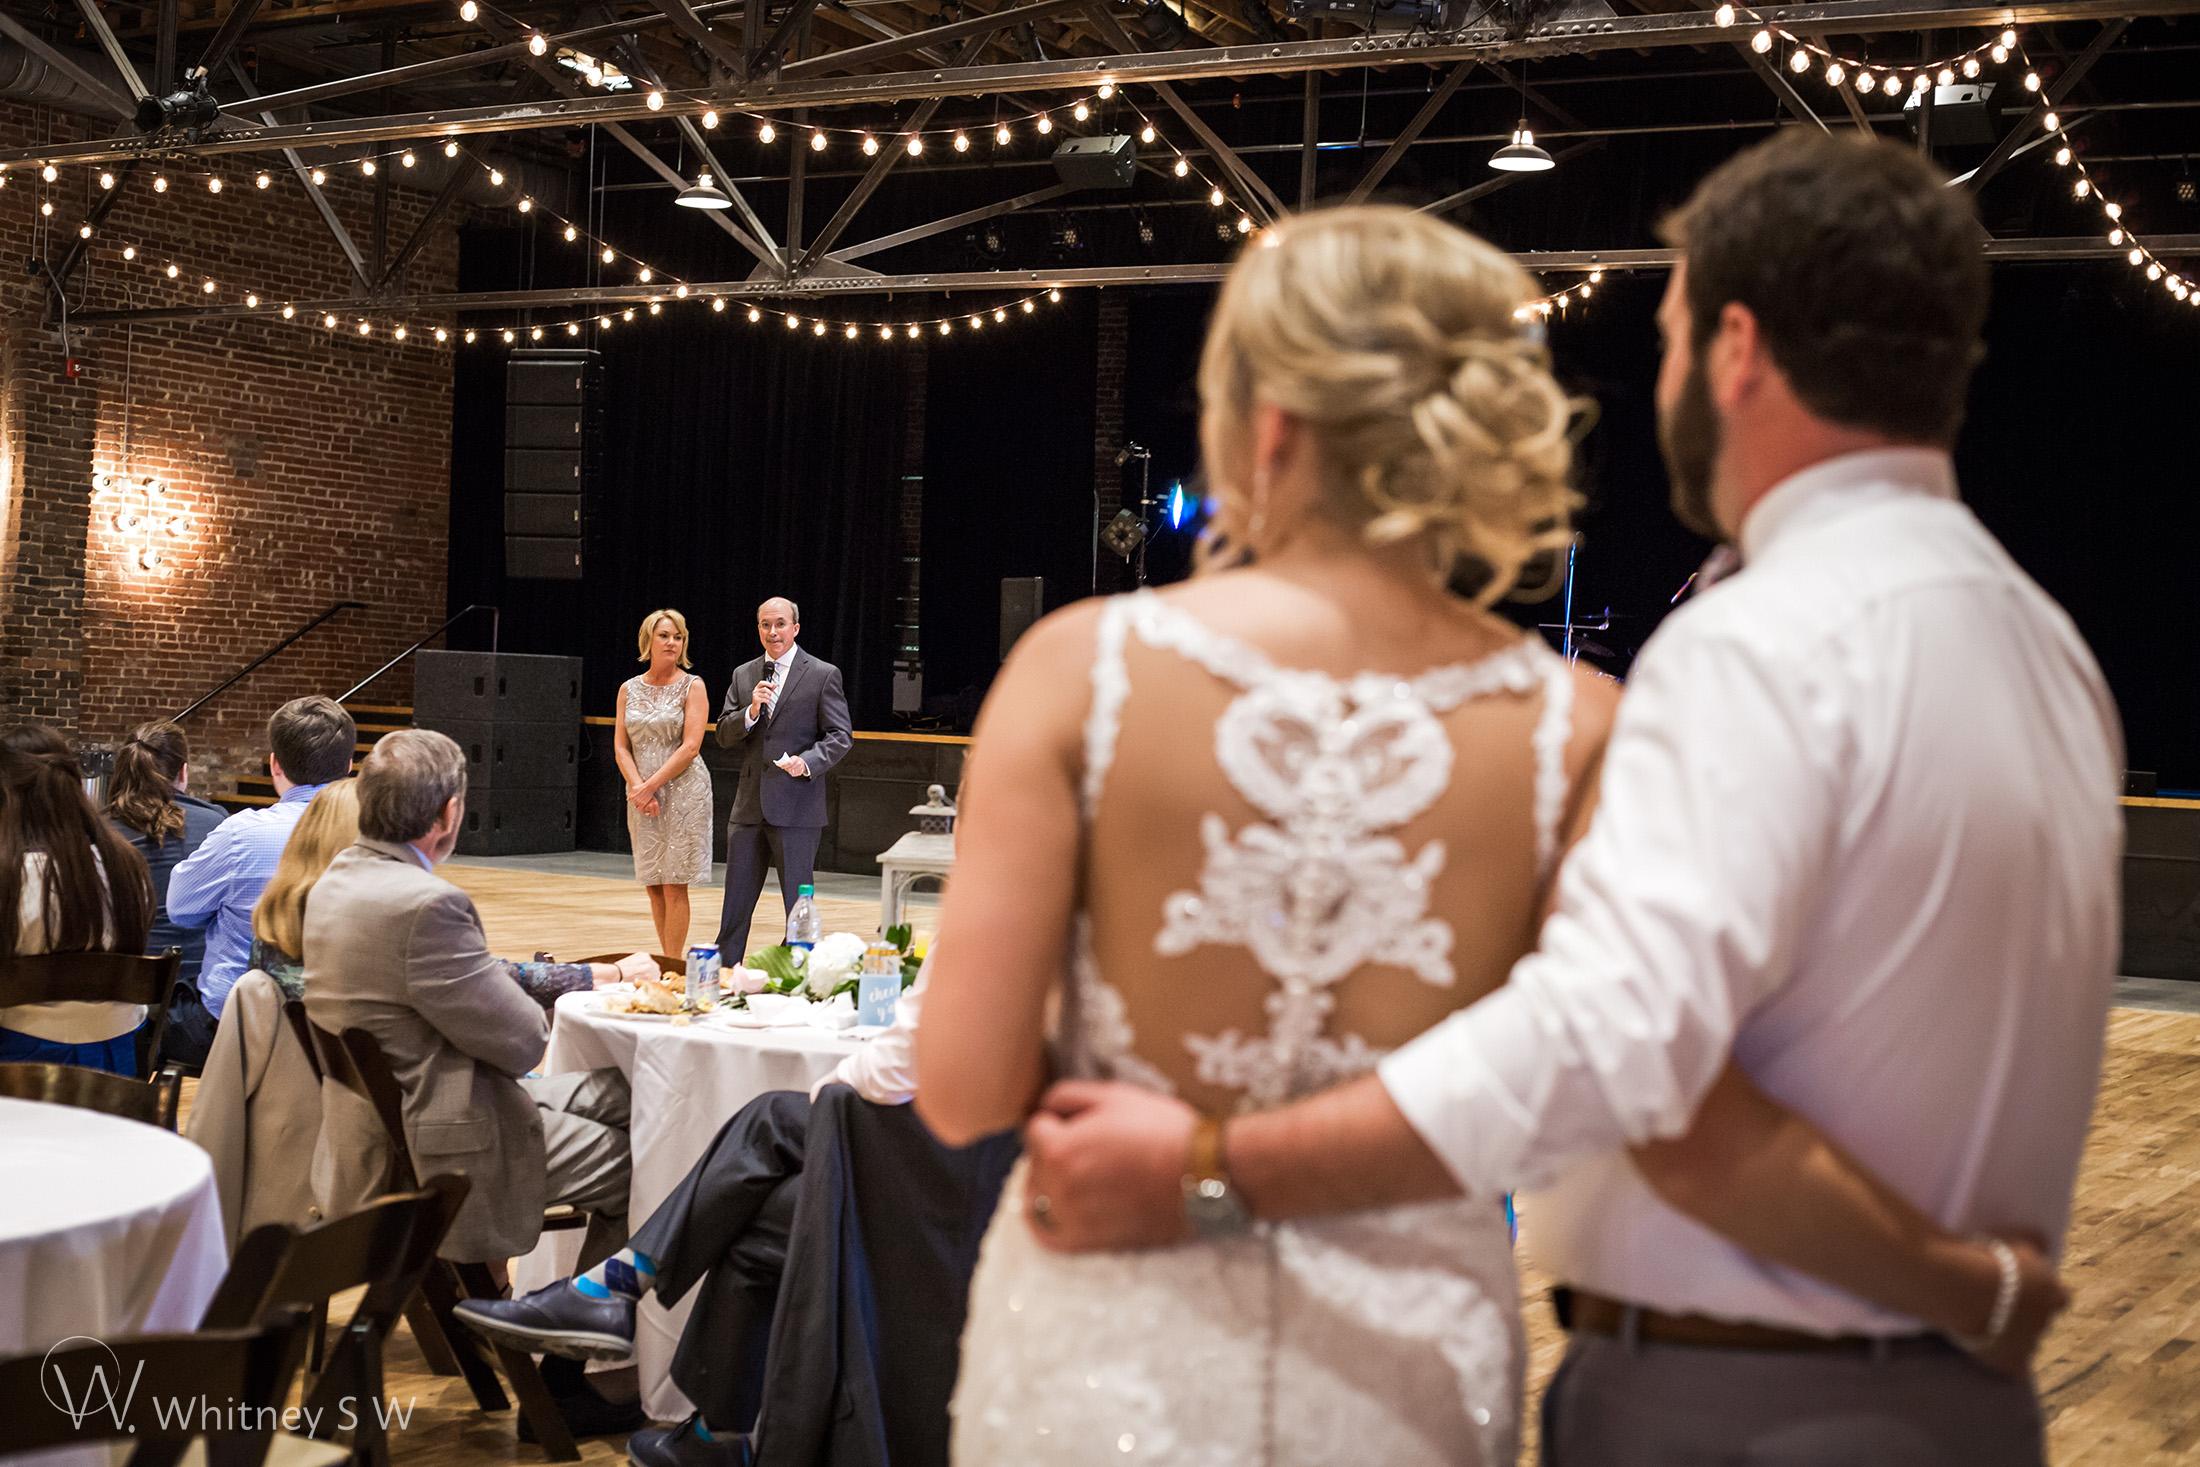 Morgan & Kaivon Wedding - Photography by Whitney S Williams whitneysw (47).jpg